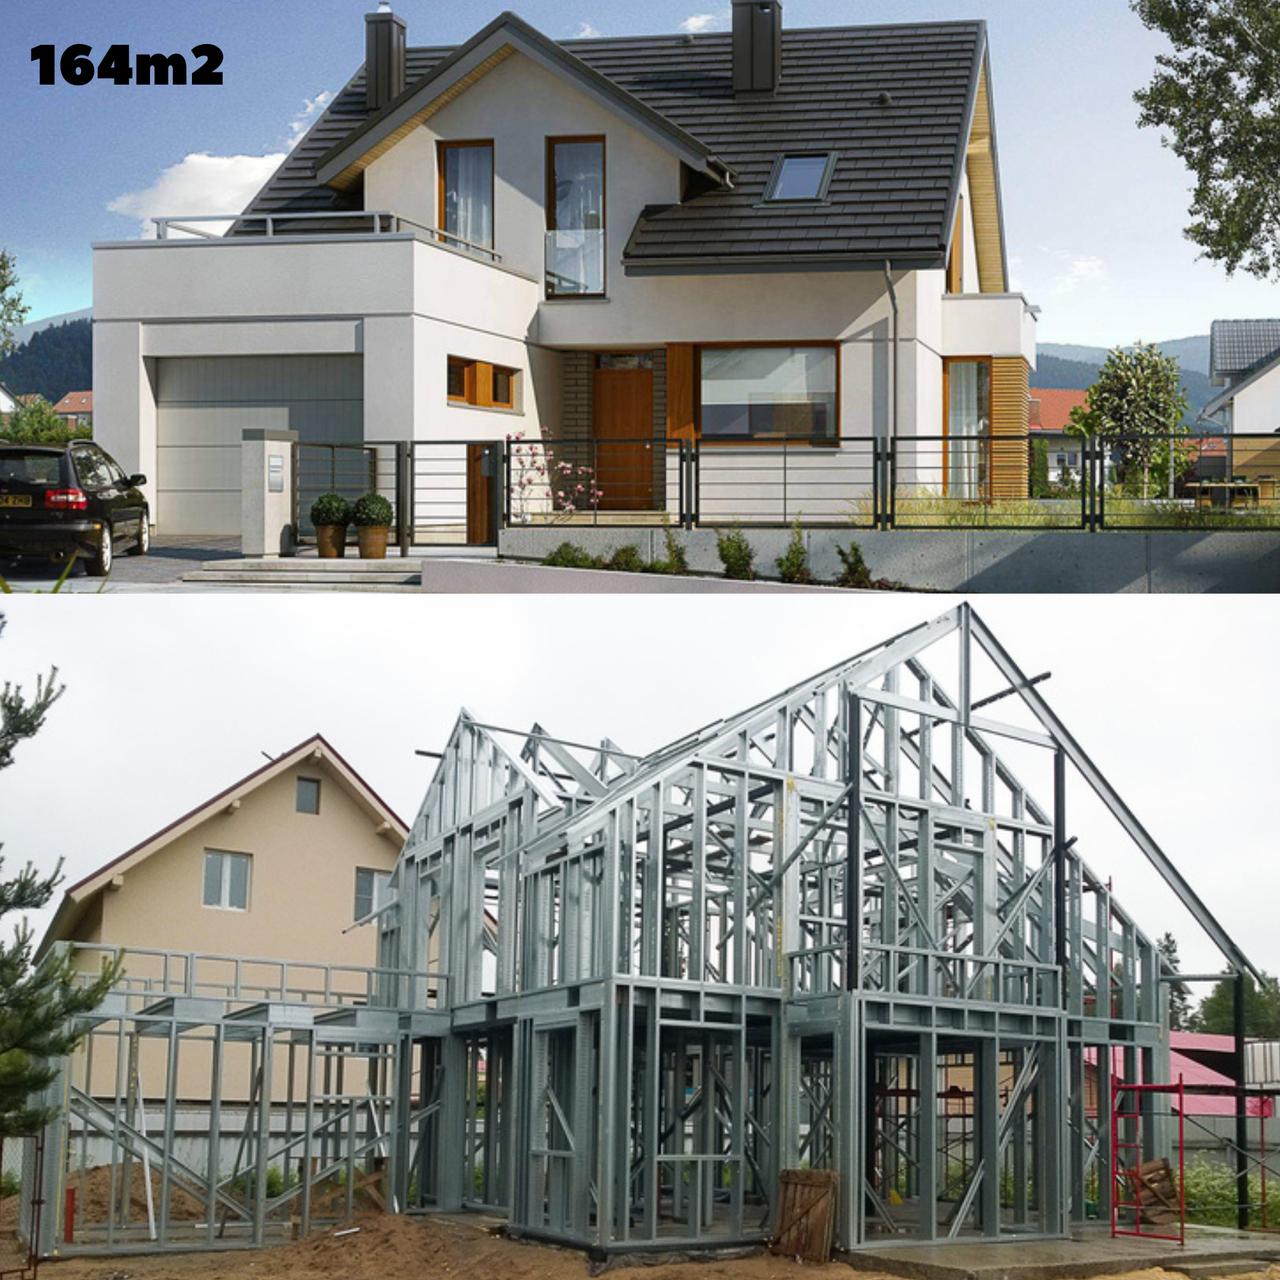 Каркасно модульный дом 164m2 из ЛСТК 16х12m